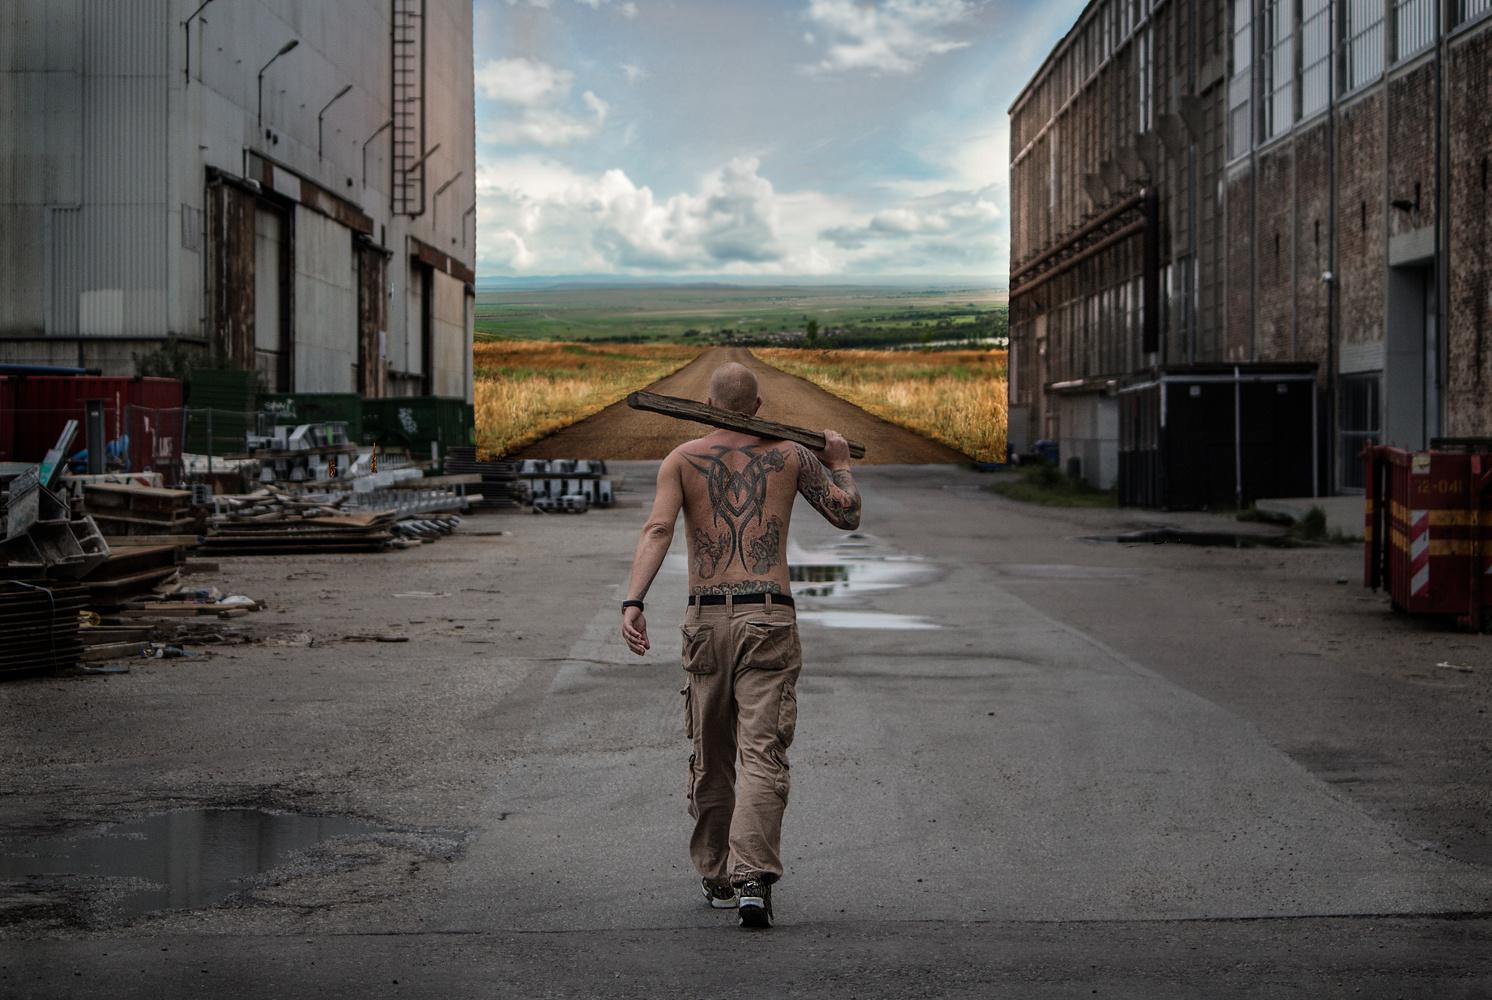 Leaving the hood by Jeanette Bernholm